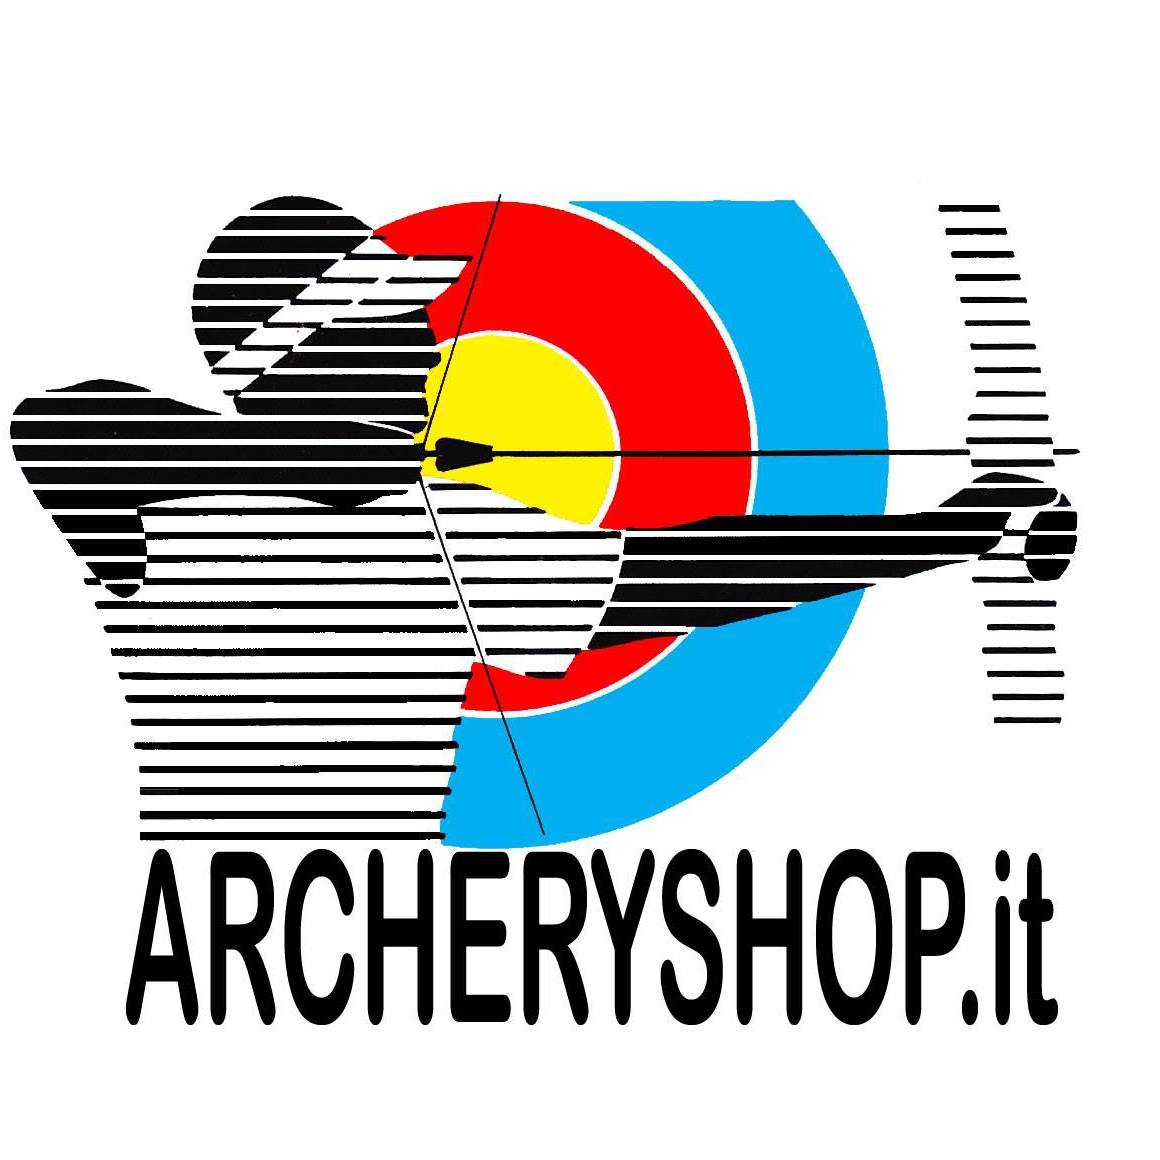 Archeryshop